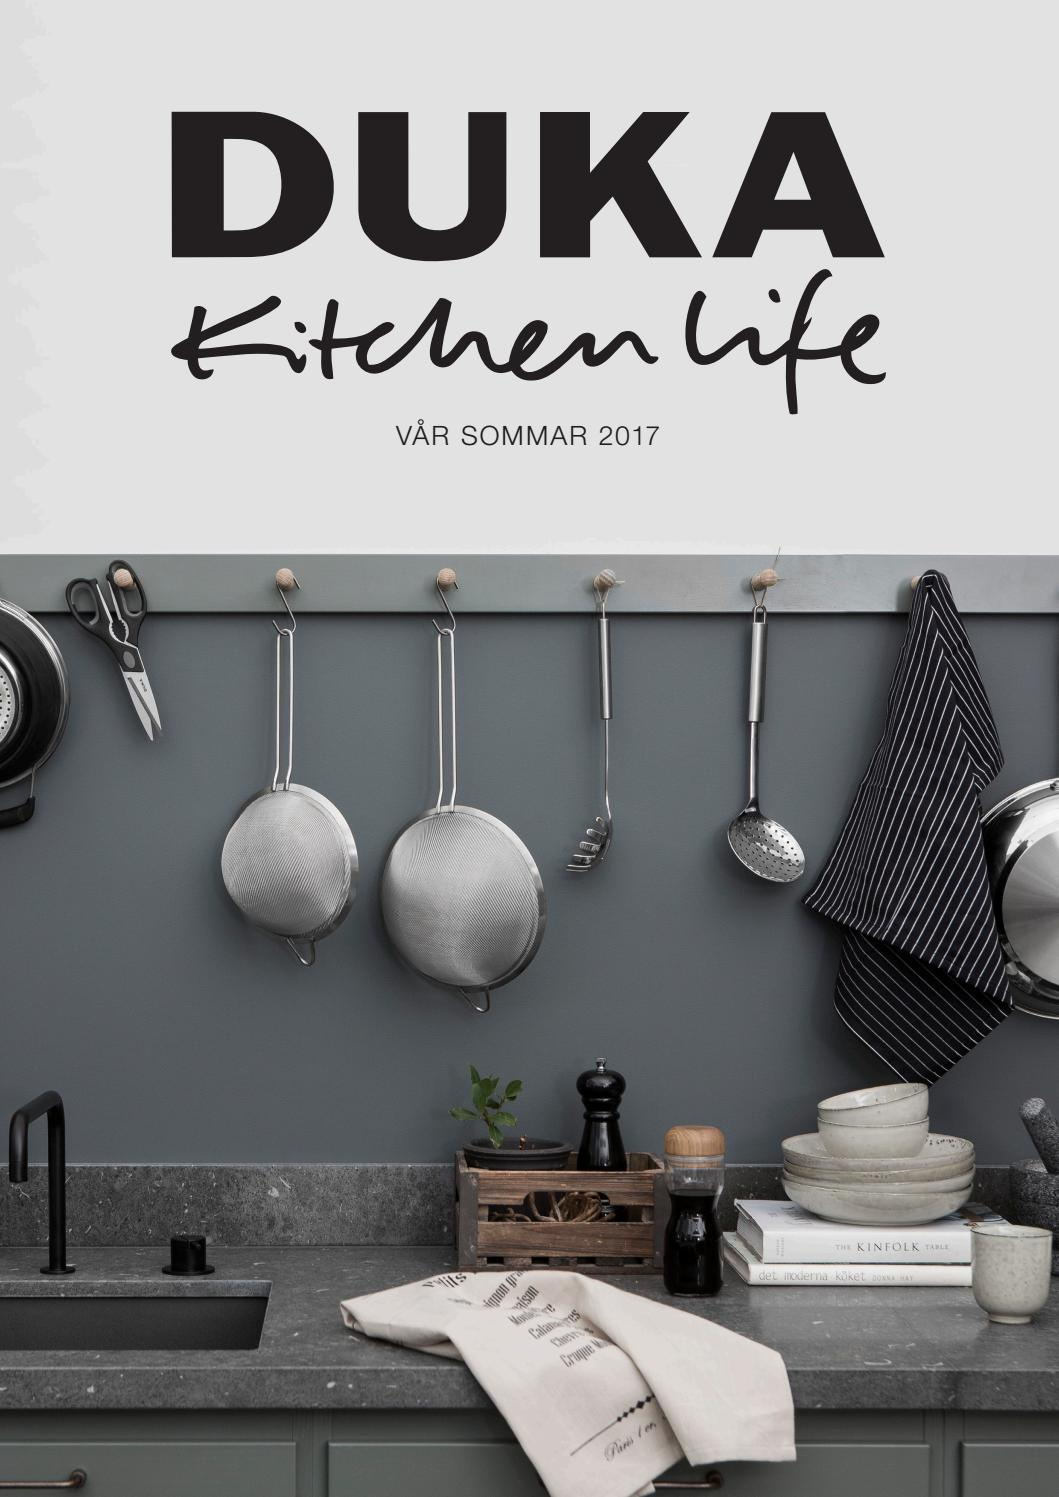 Duka Kitchen Life - Autumn and Winter by Duka Kitchen Life - issuu